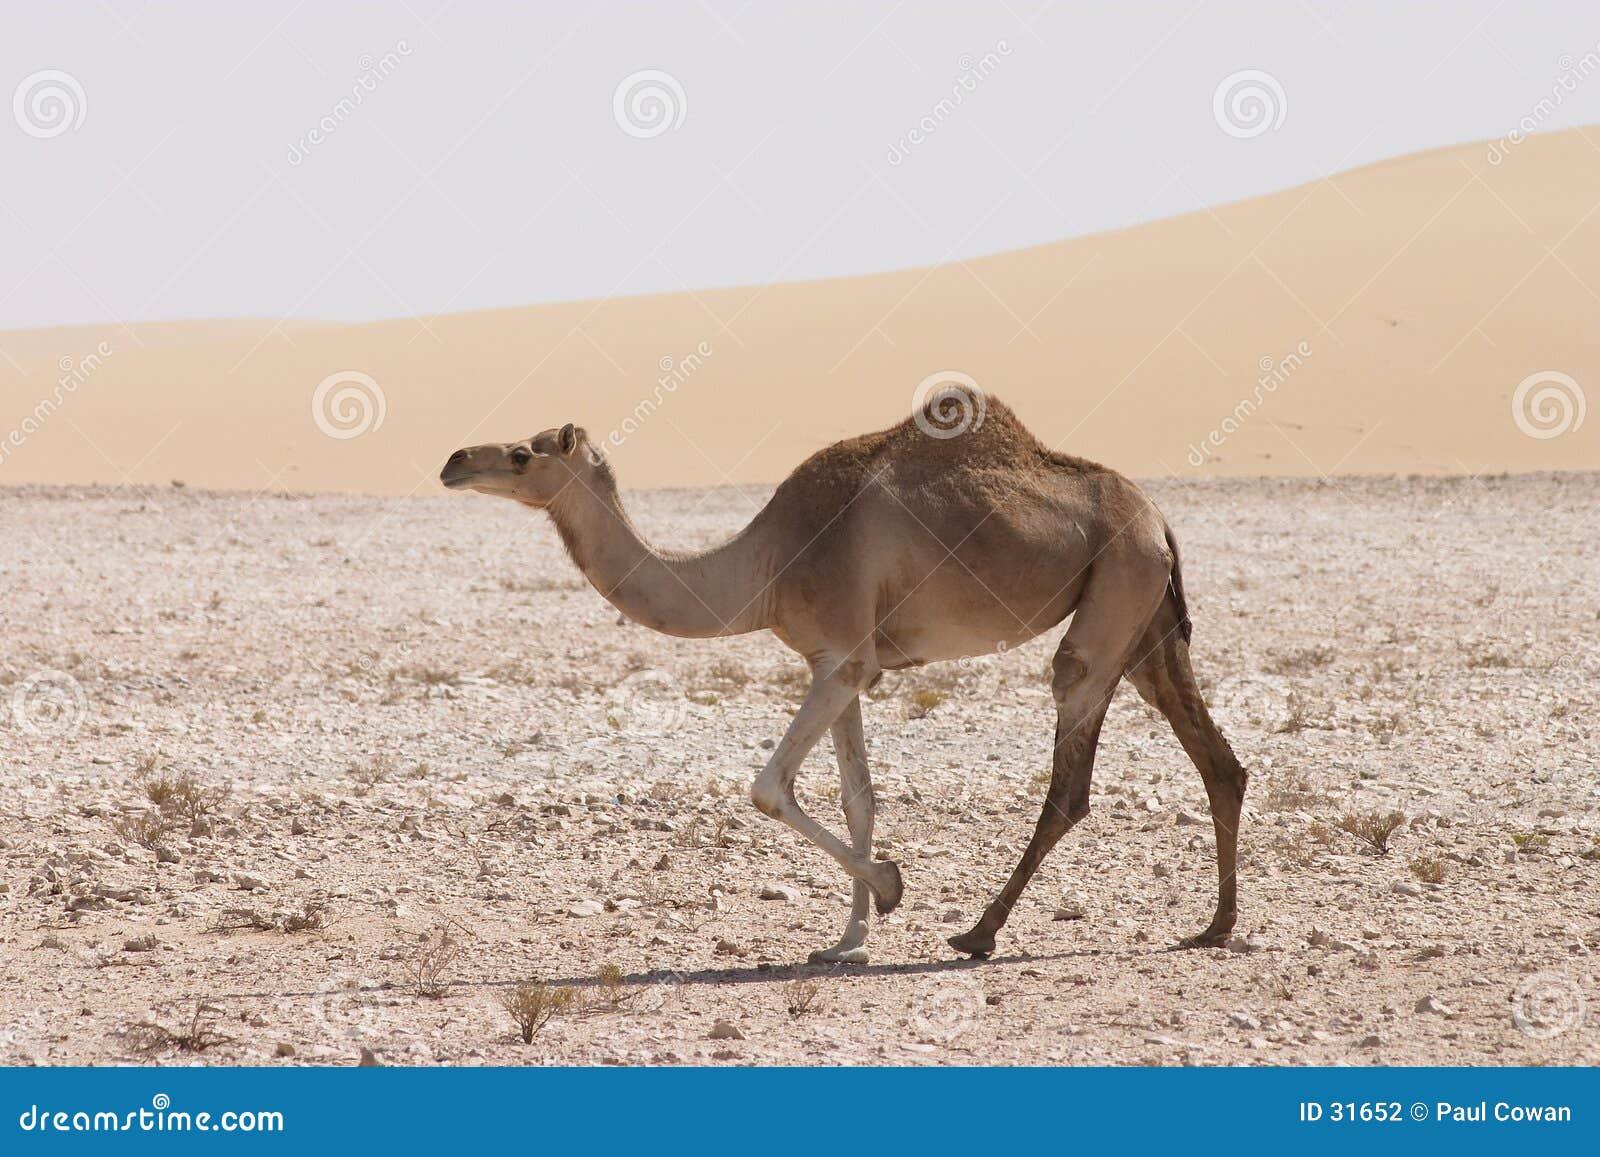 Camel in the Qatari desert